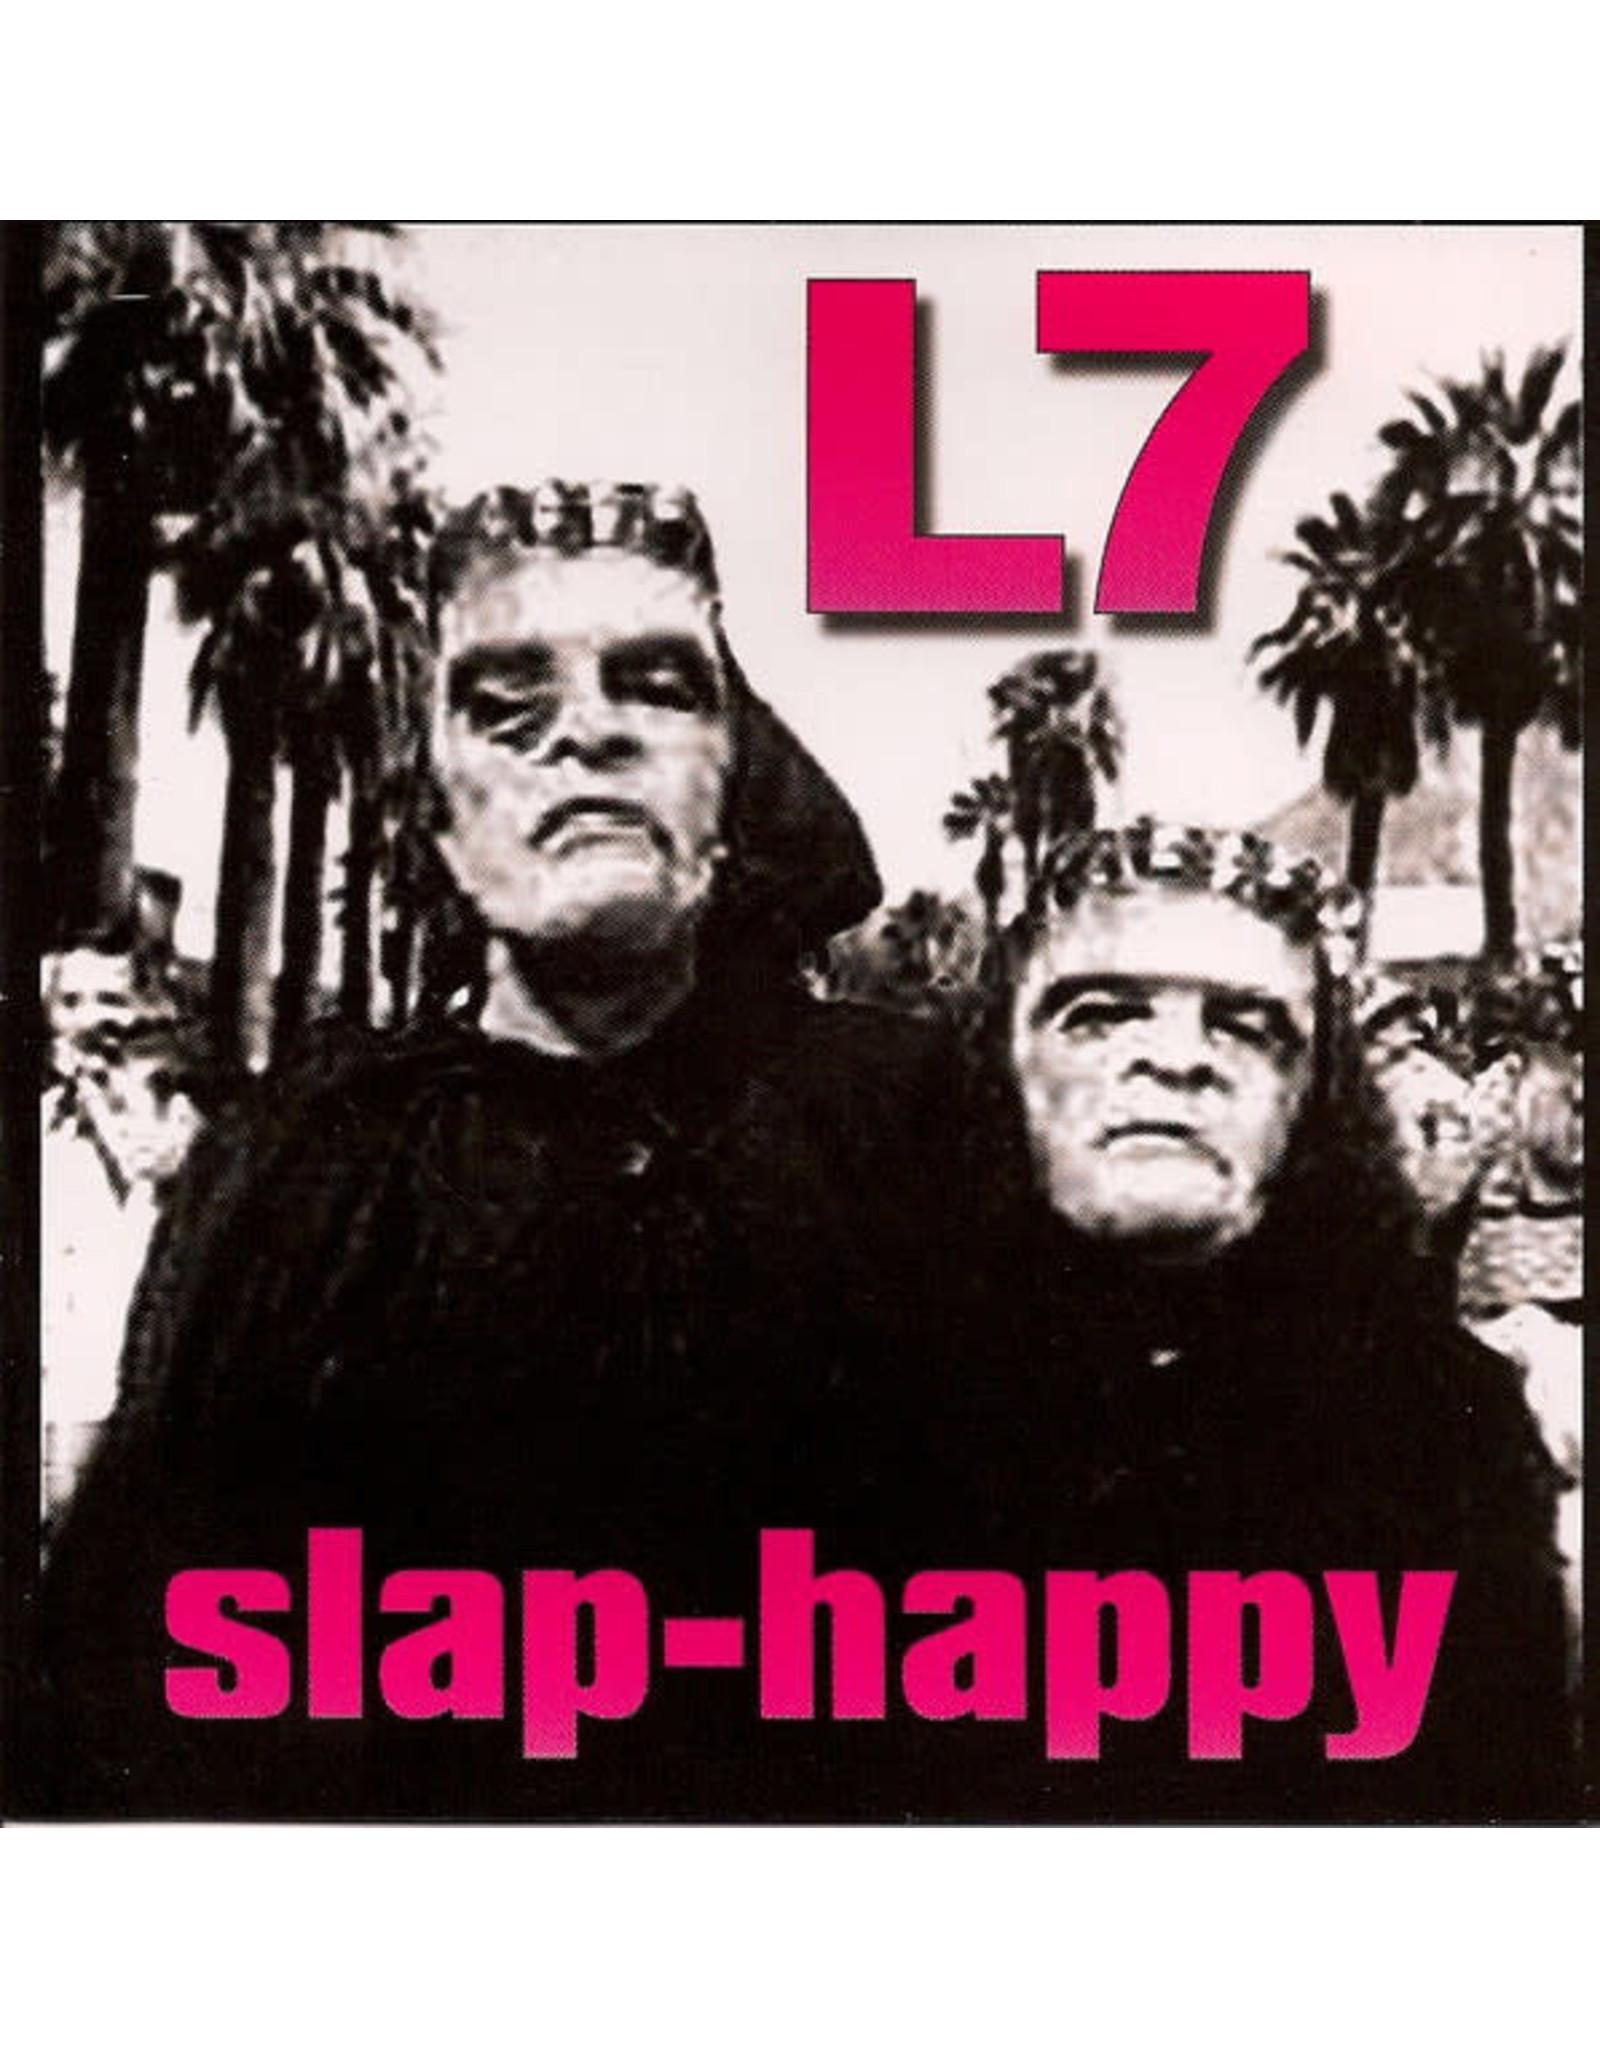 L7 - Slap-Happy LP